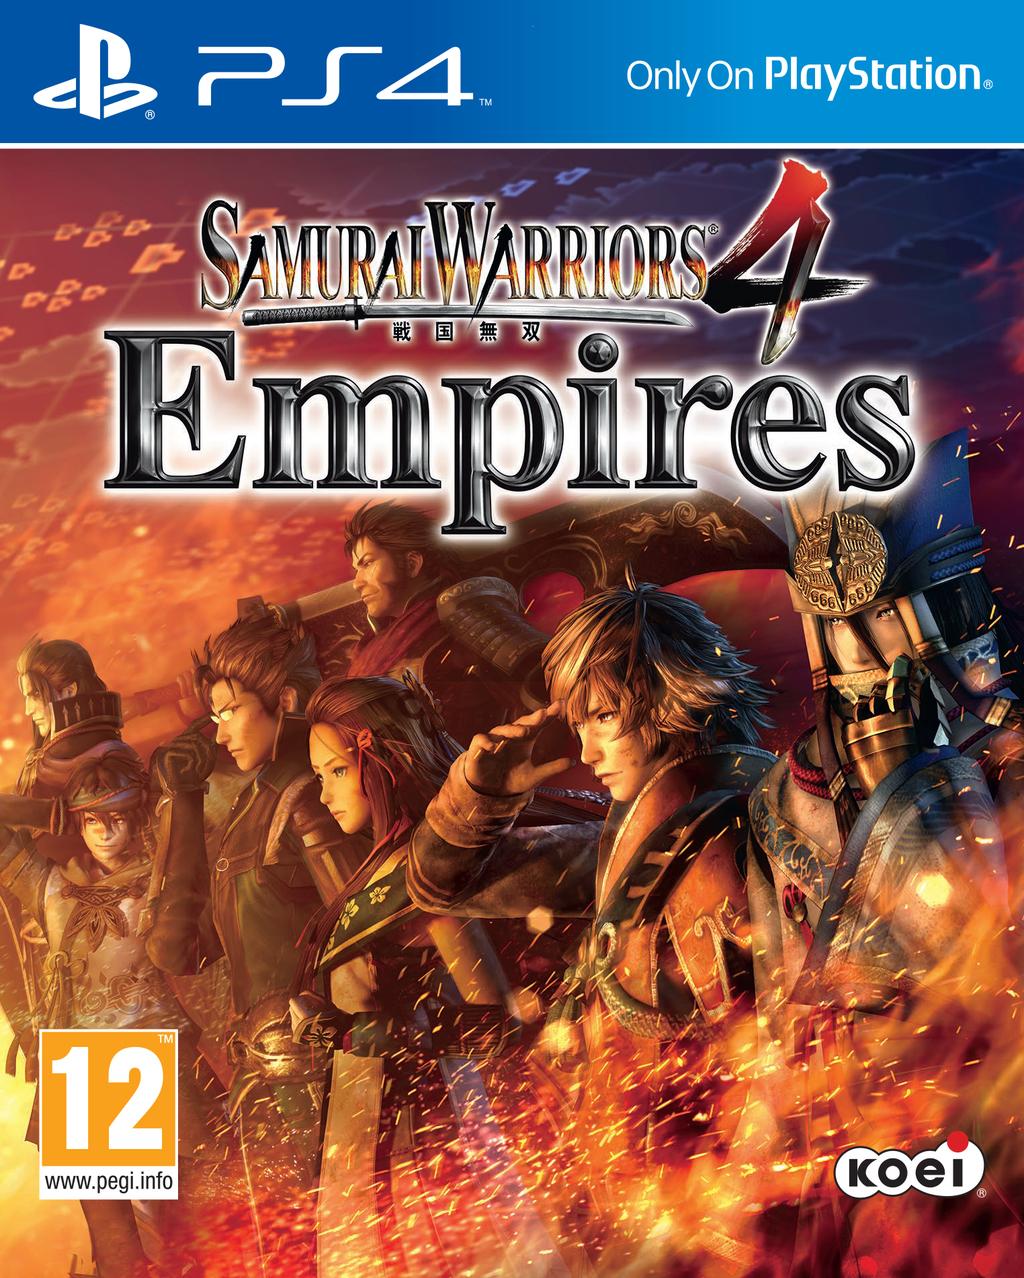 samurai-warriors-4-empires-ps4-boxart-01